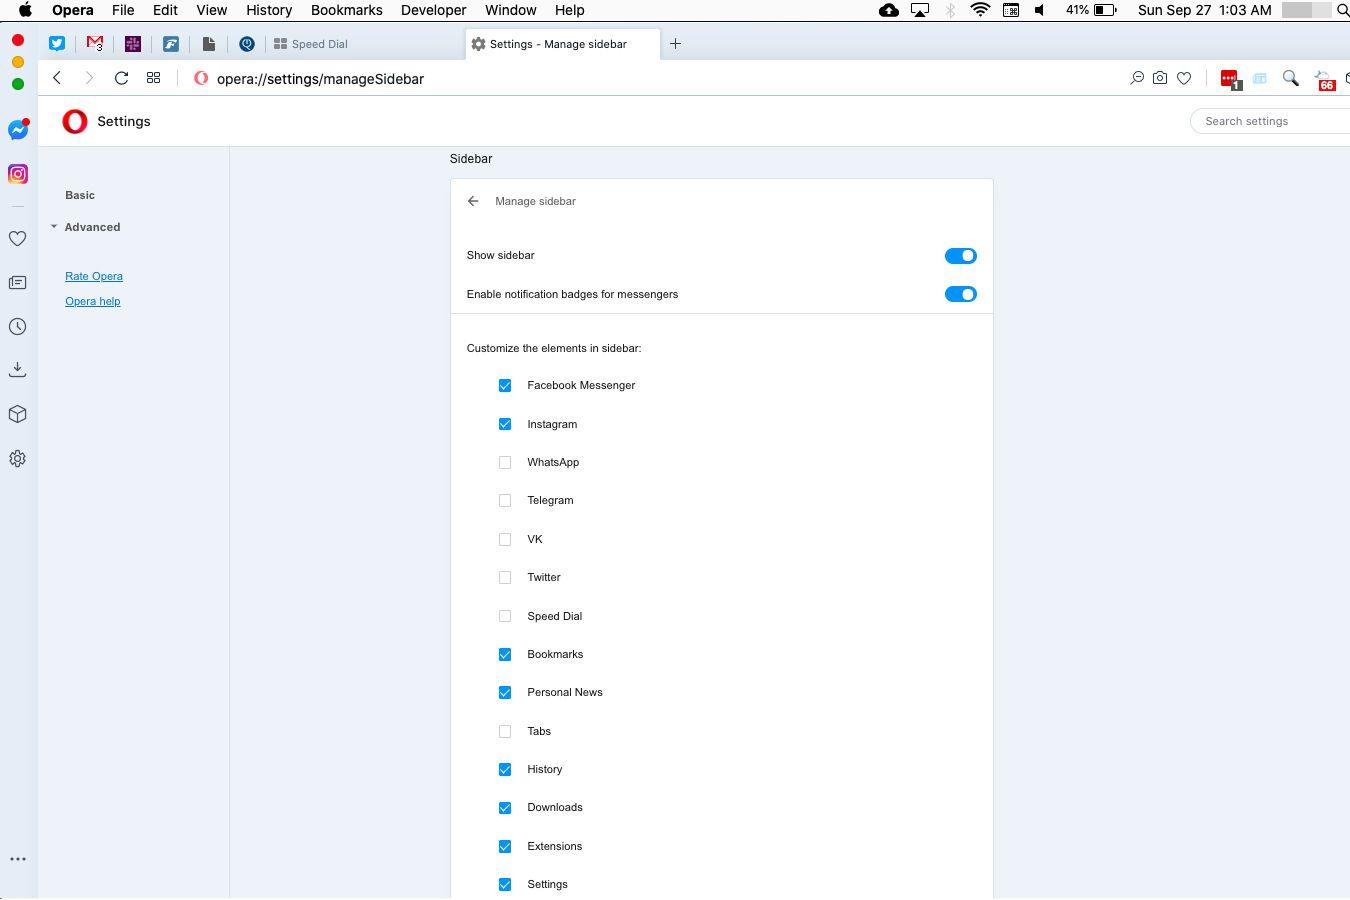 Opera sidebar settings